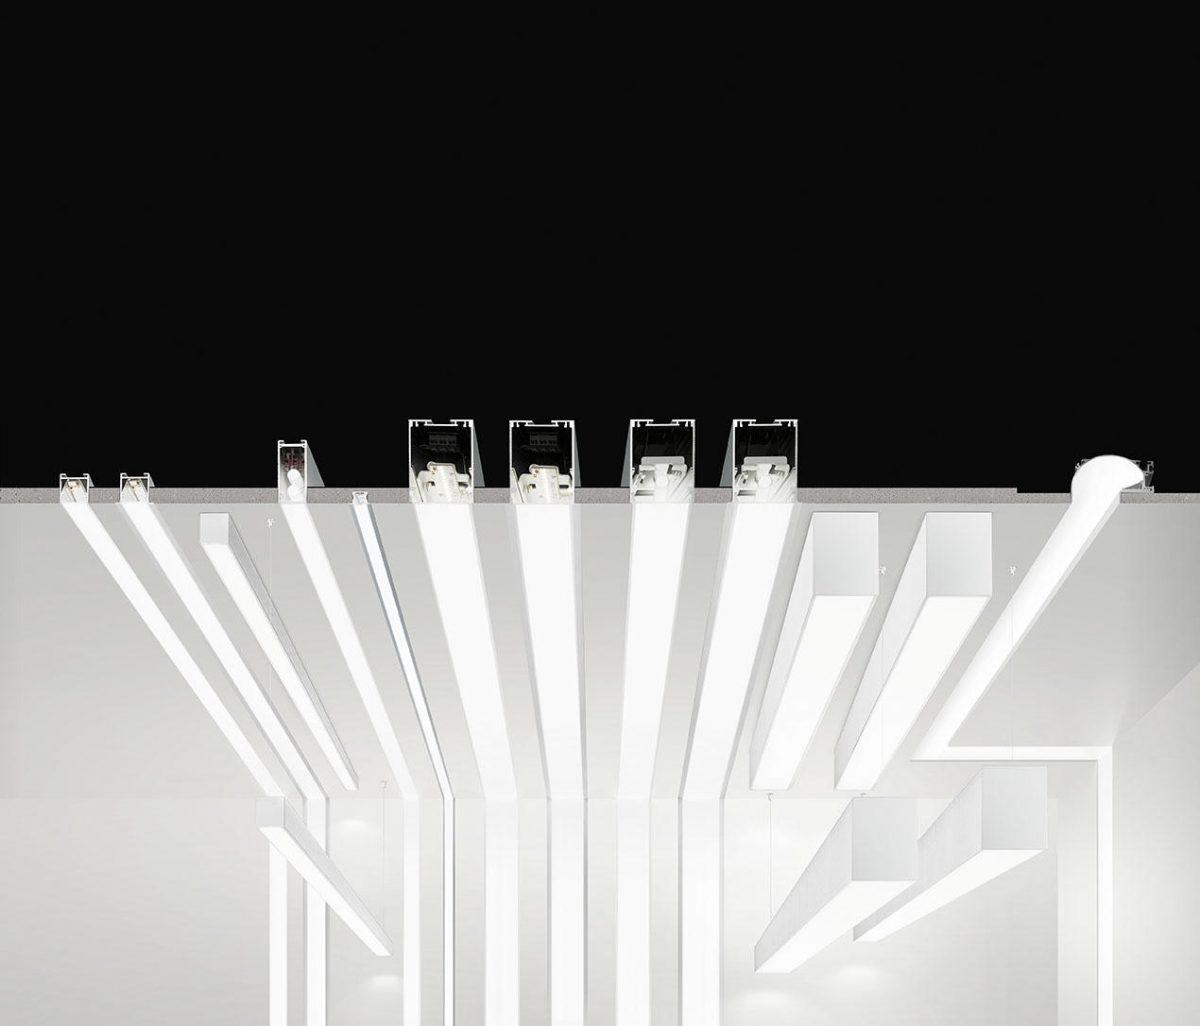 profili-illuminazione-linee-cartongesso